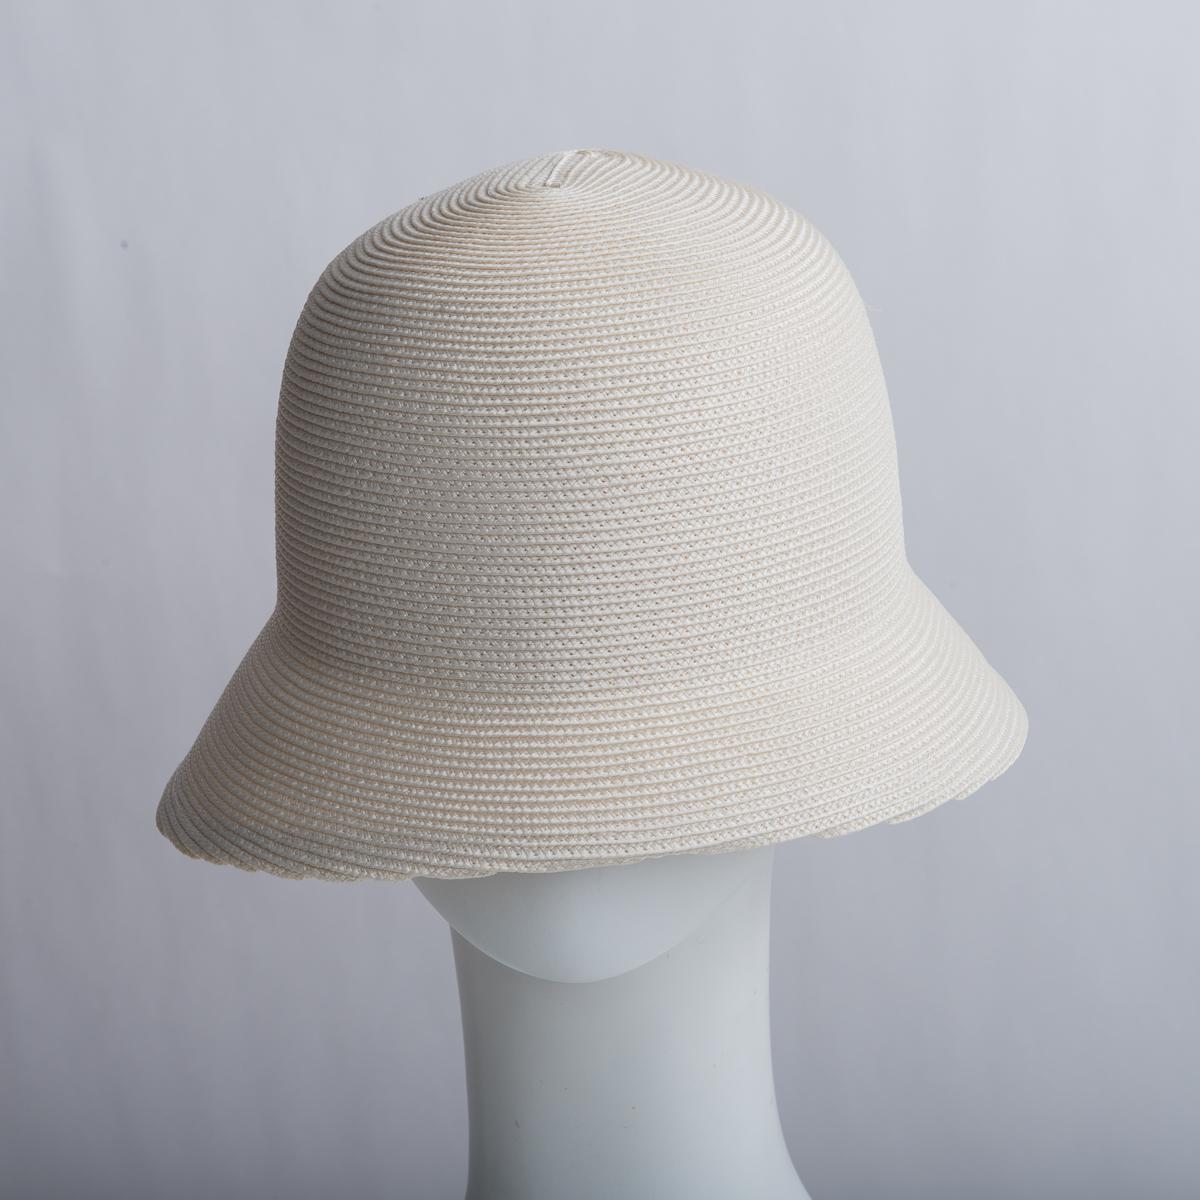 ddb10c2007c46b Dull Polypropylene Straw Medium Brim Plain Hats-Y7005_88- Sun Yorkos | Zoria